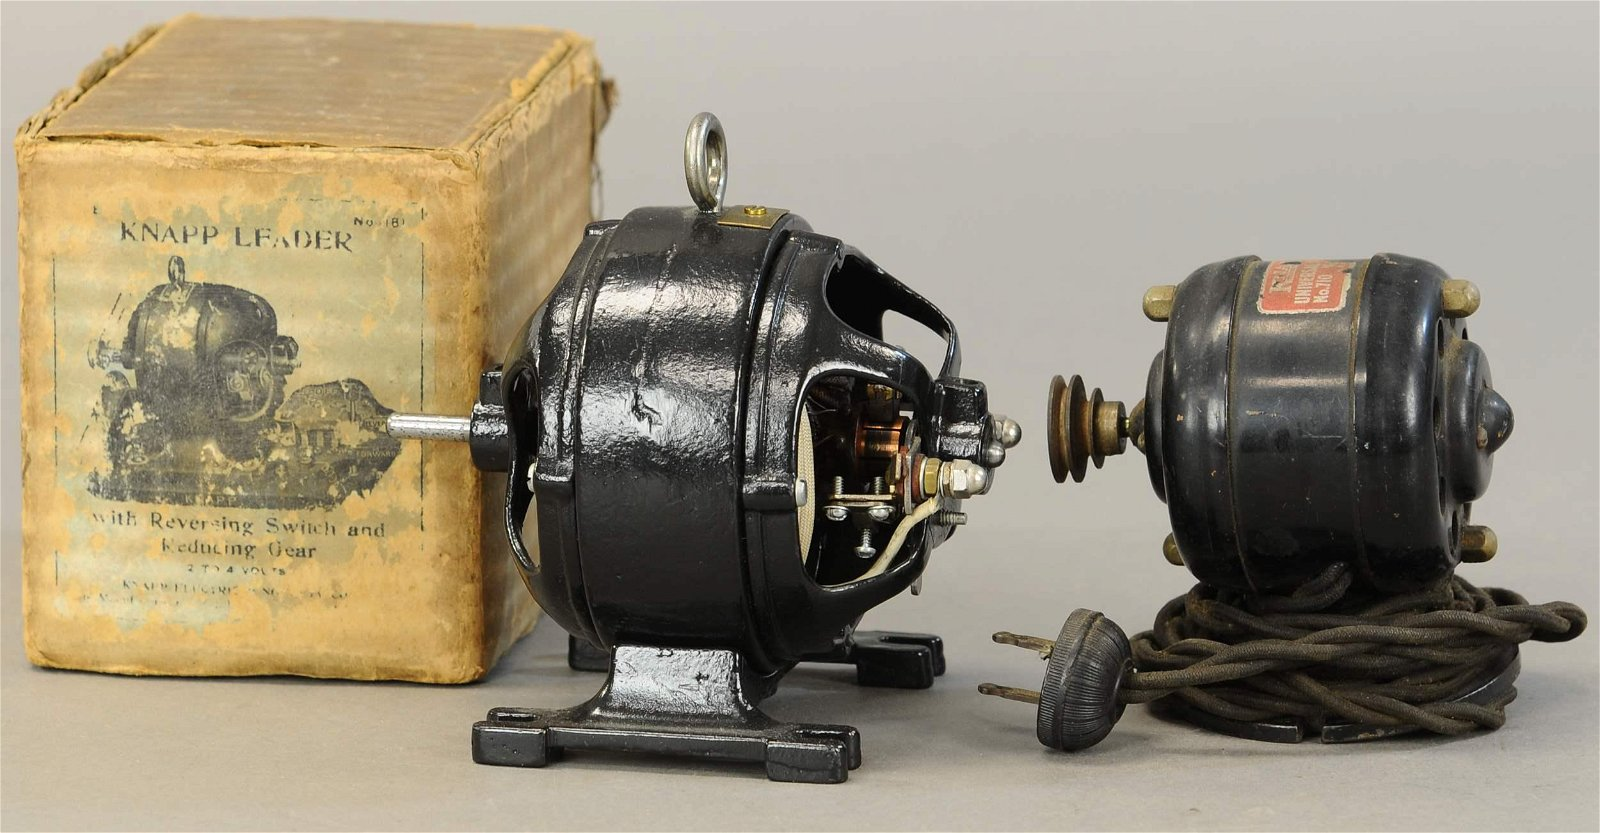 TWO LARGE KNAPP ELECTRIC MOTORS